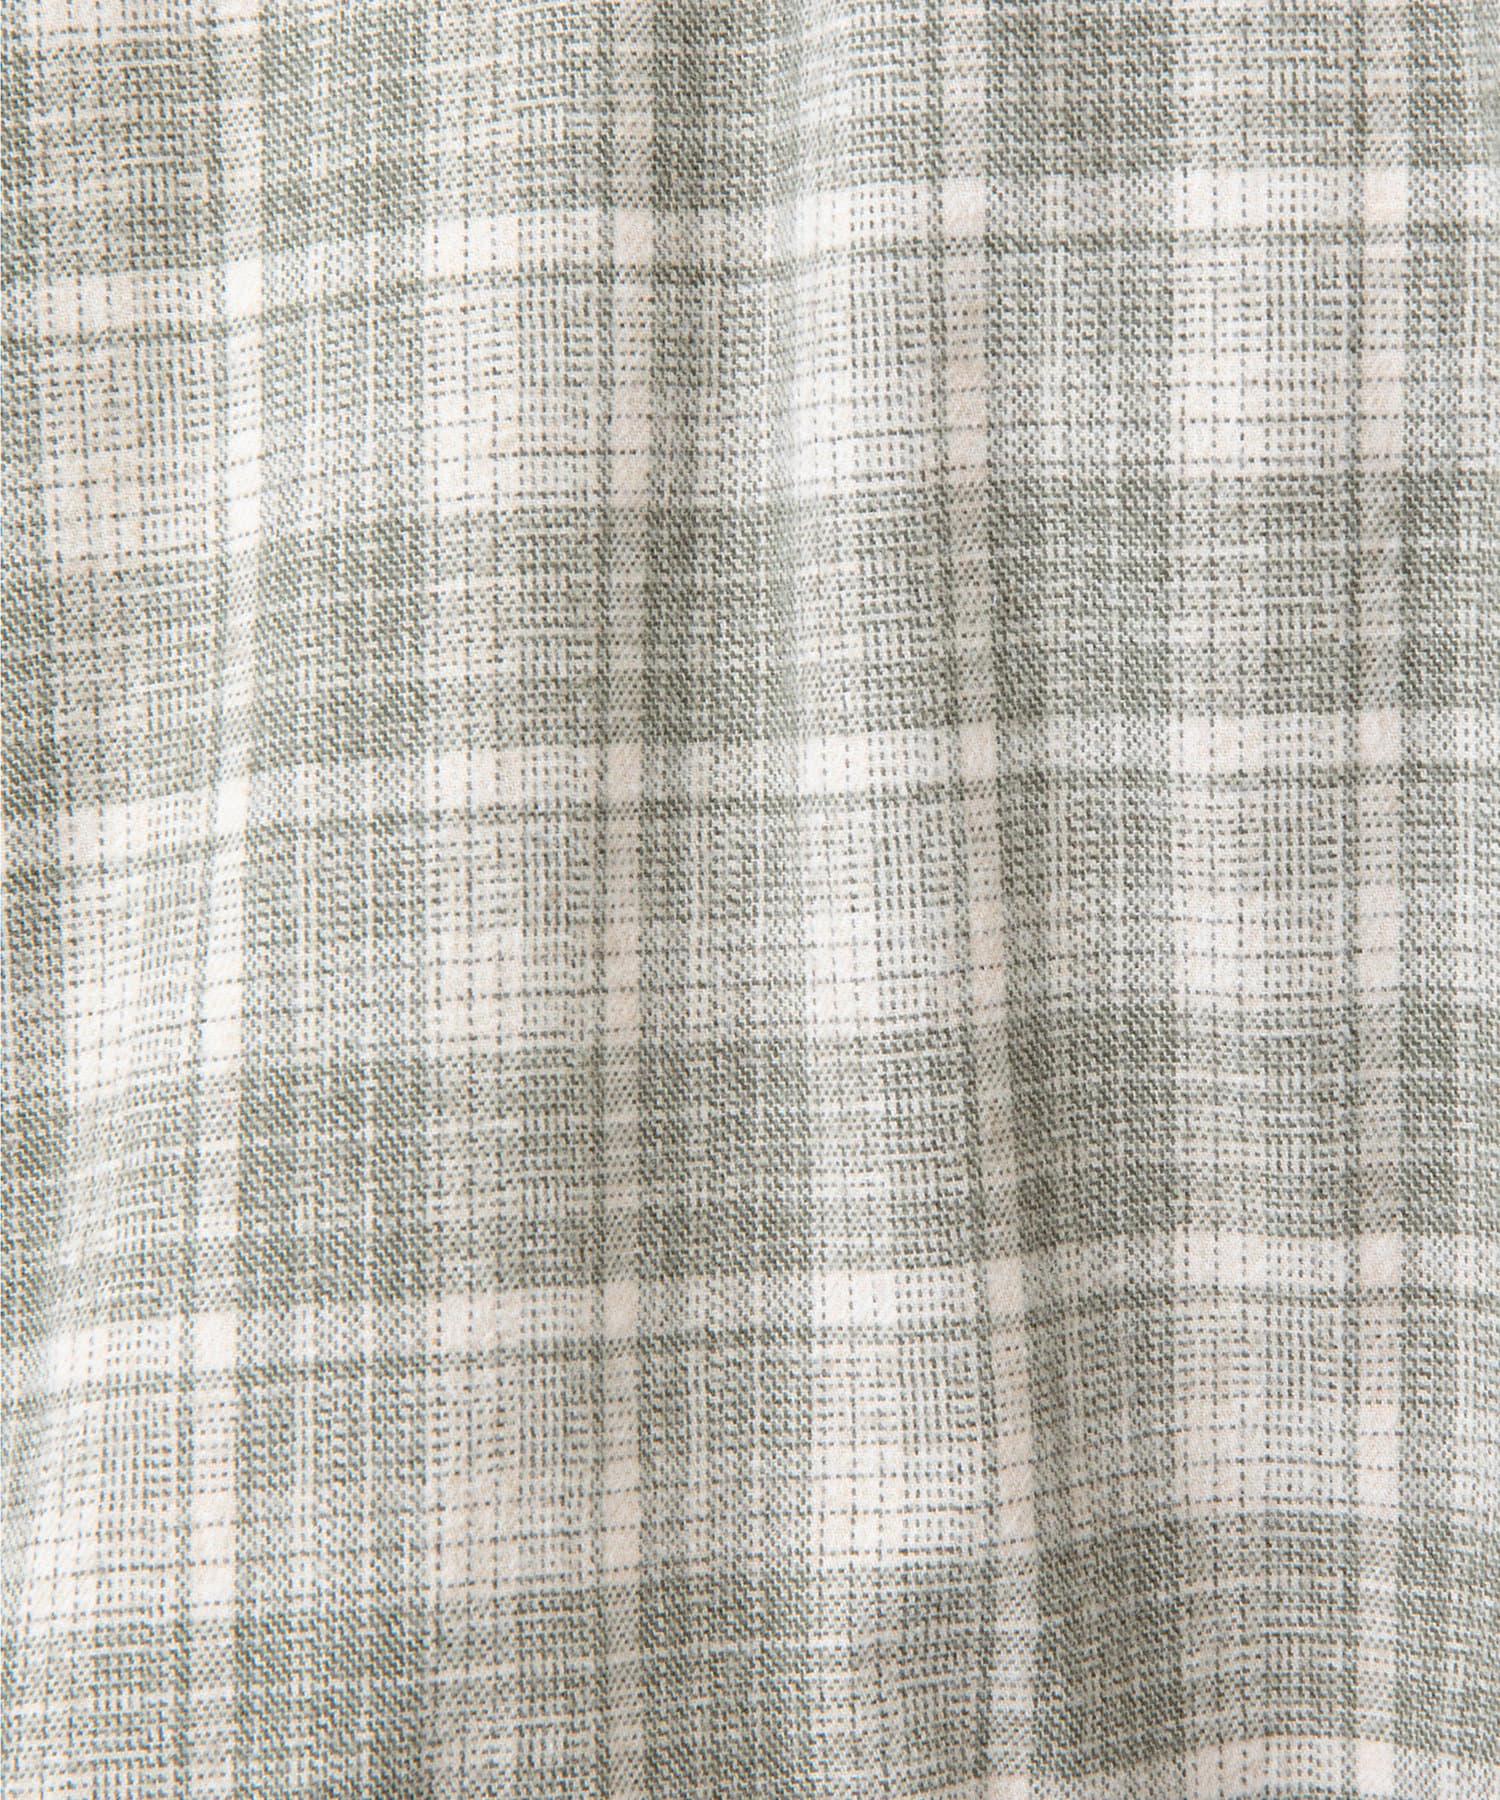 GALLARDAGALANTE(ガリャルダガランテ) 【HERITANOVUM】オーバーチェックシャツワンピース